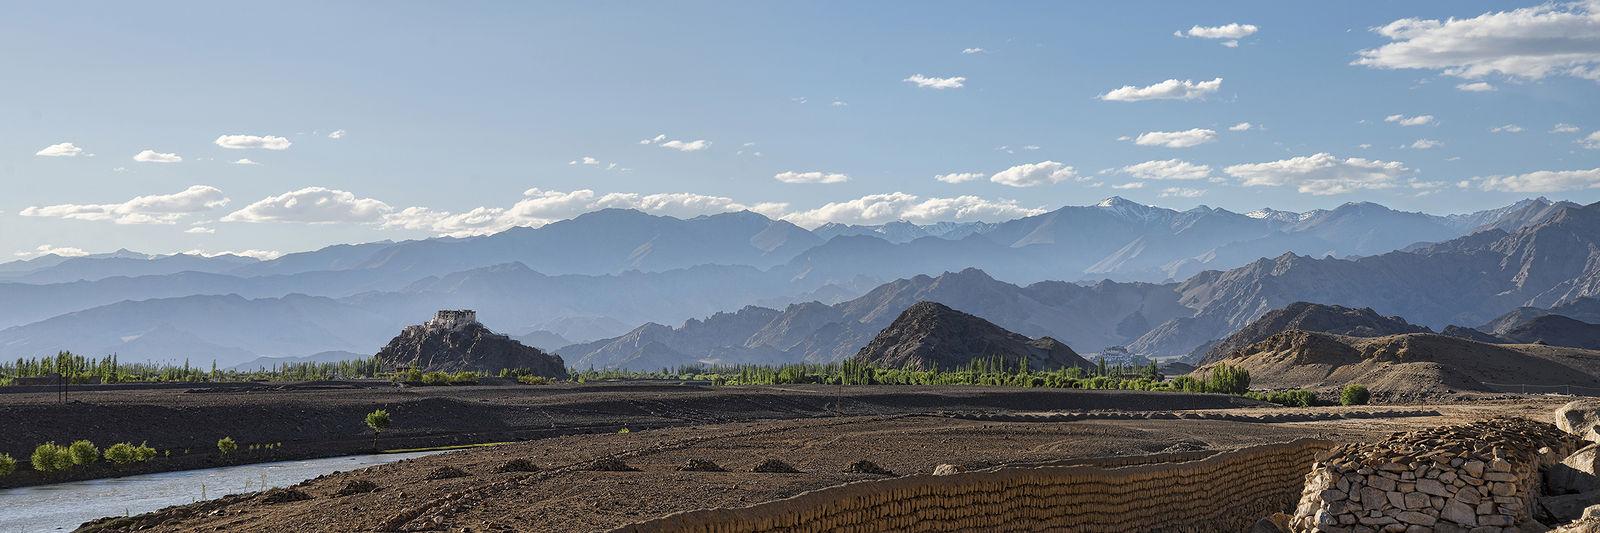 Ivan Aleshin. NH21 and other Himalayan Roads. 0010